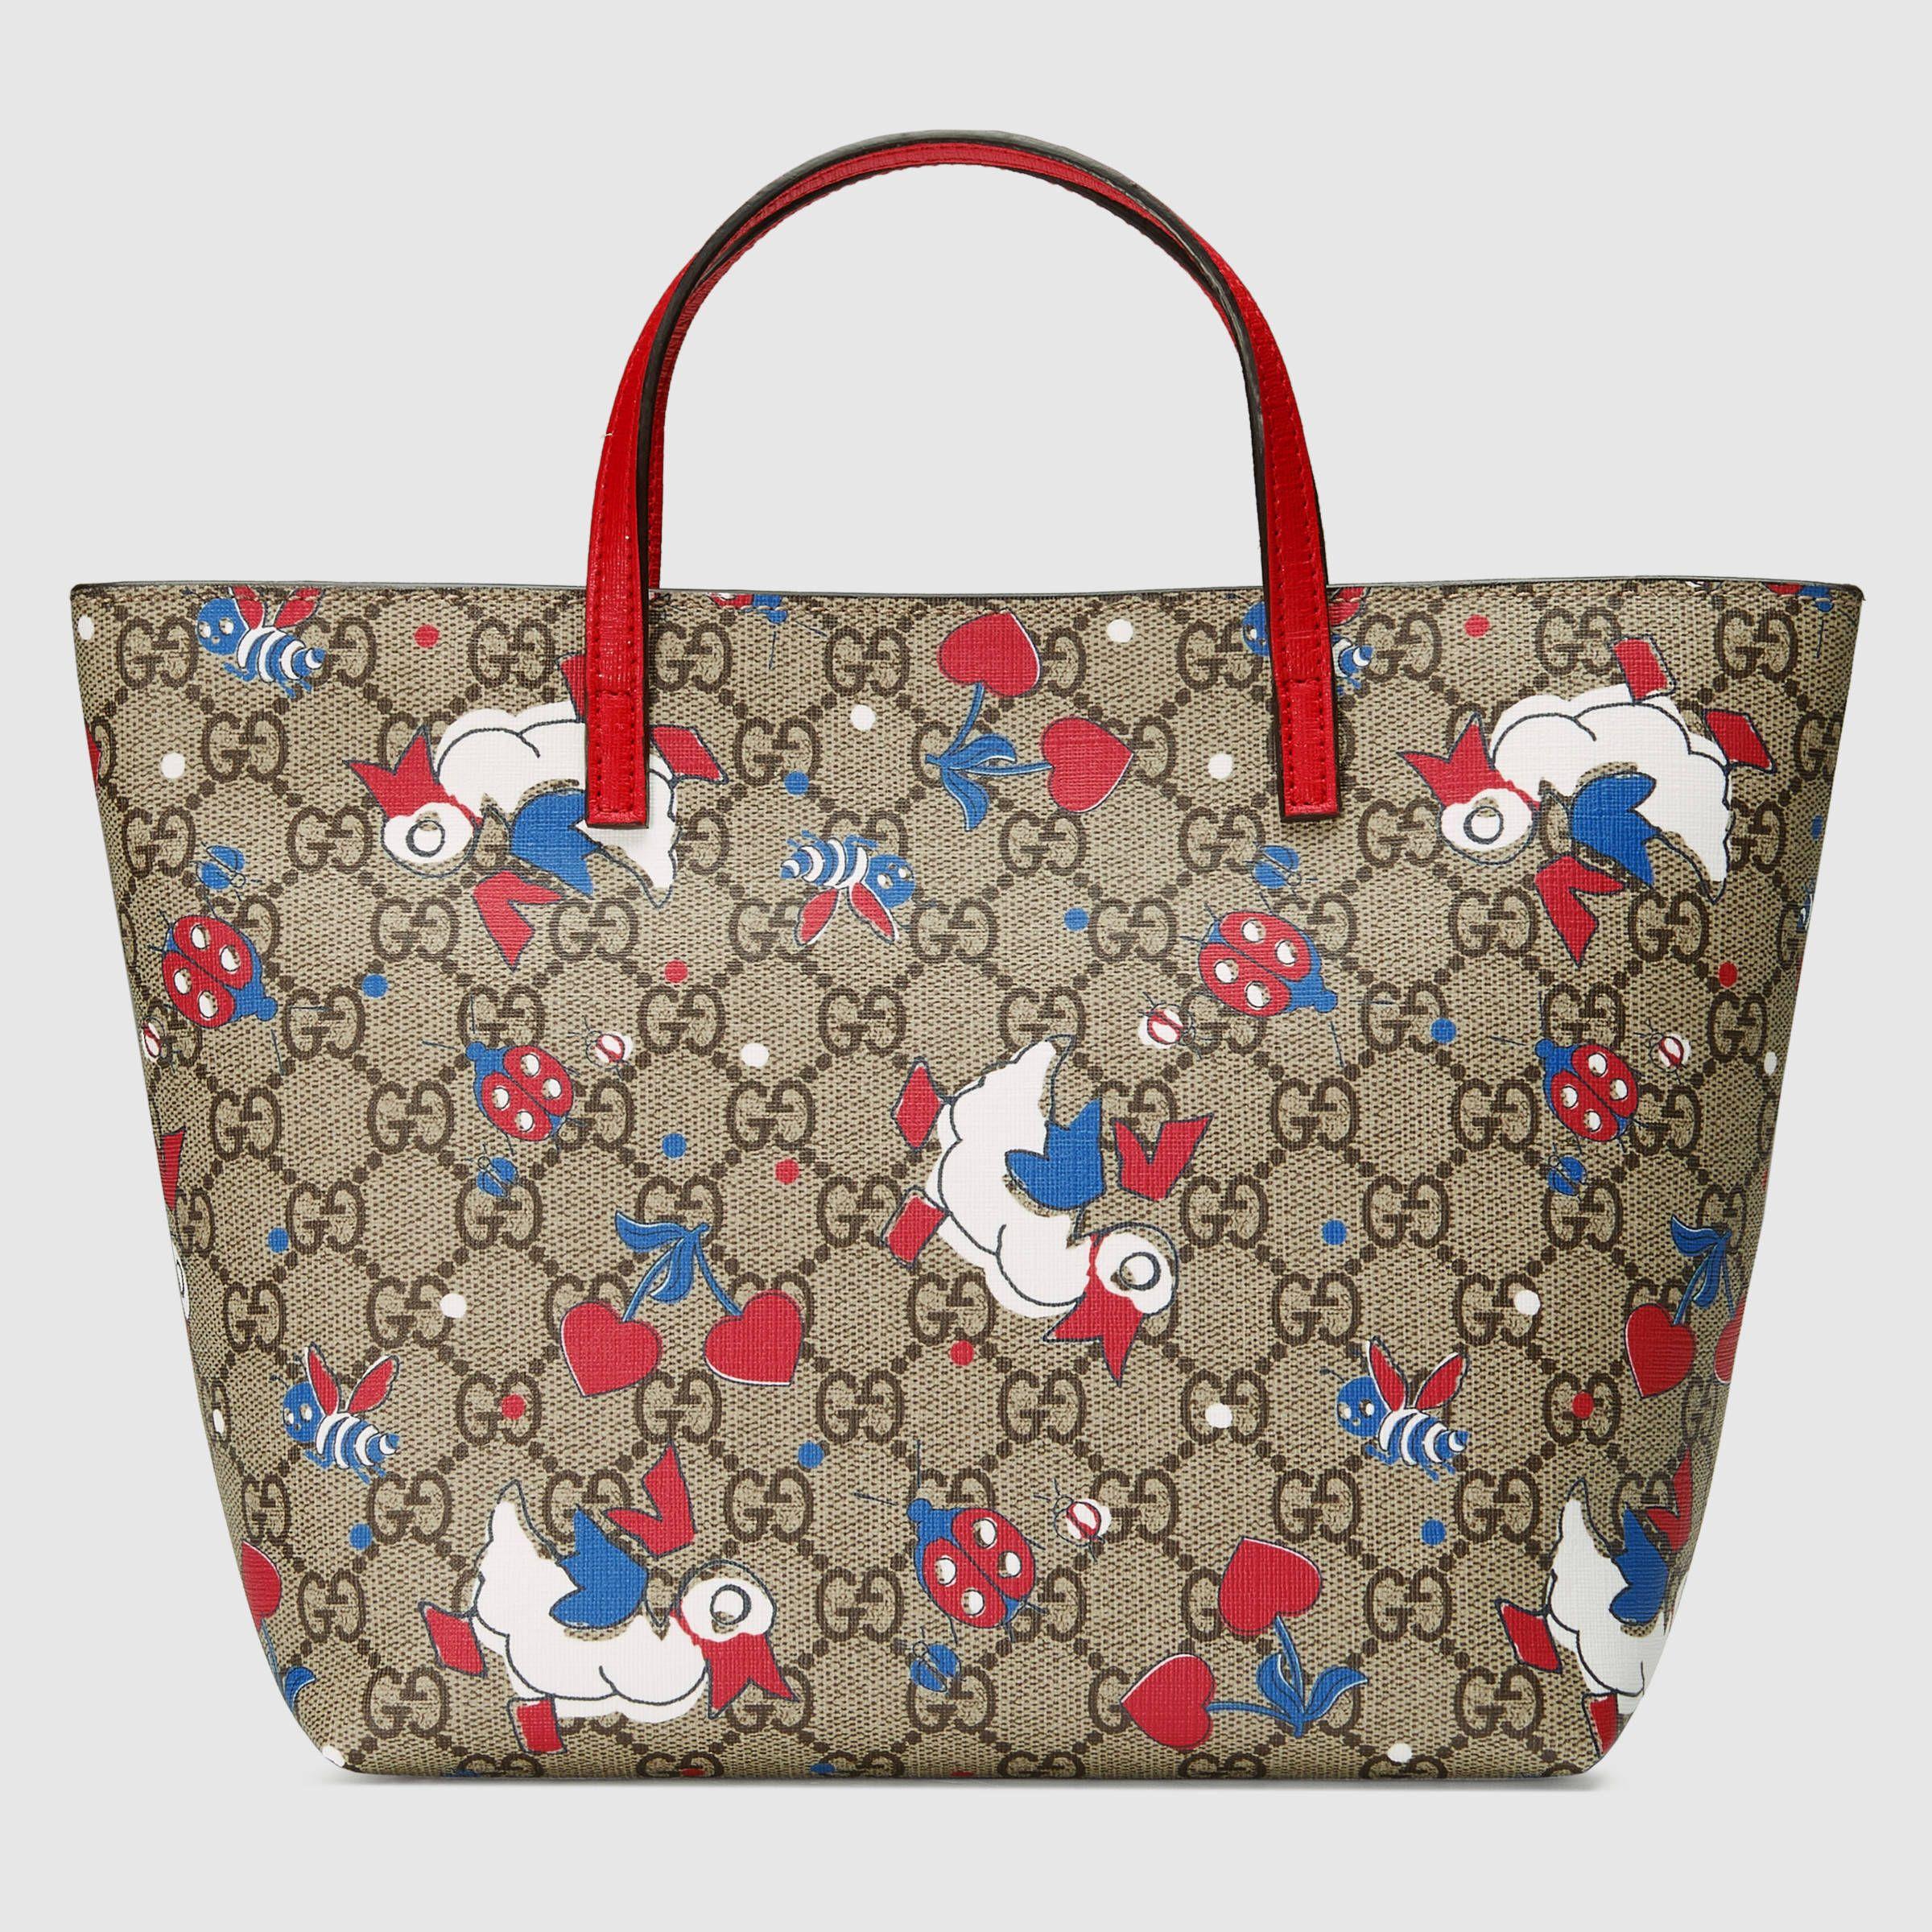 a147ace879 Children's GG ducks tote - Gucci Children's Gifts 410812K9E2N9290 ...